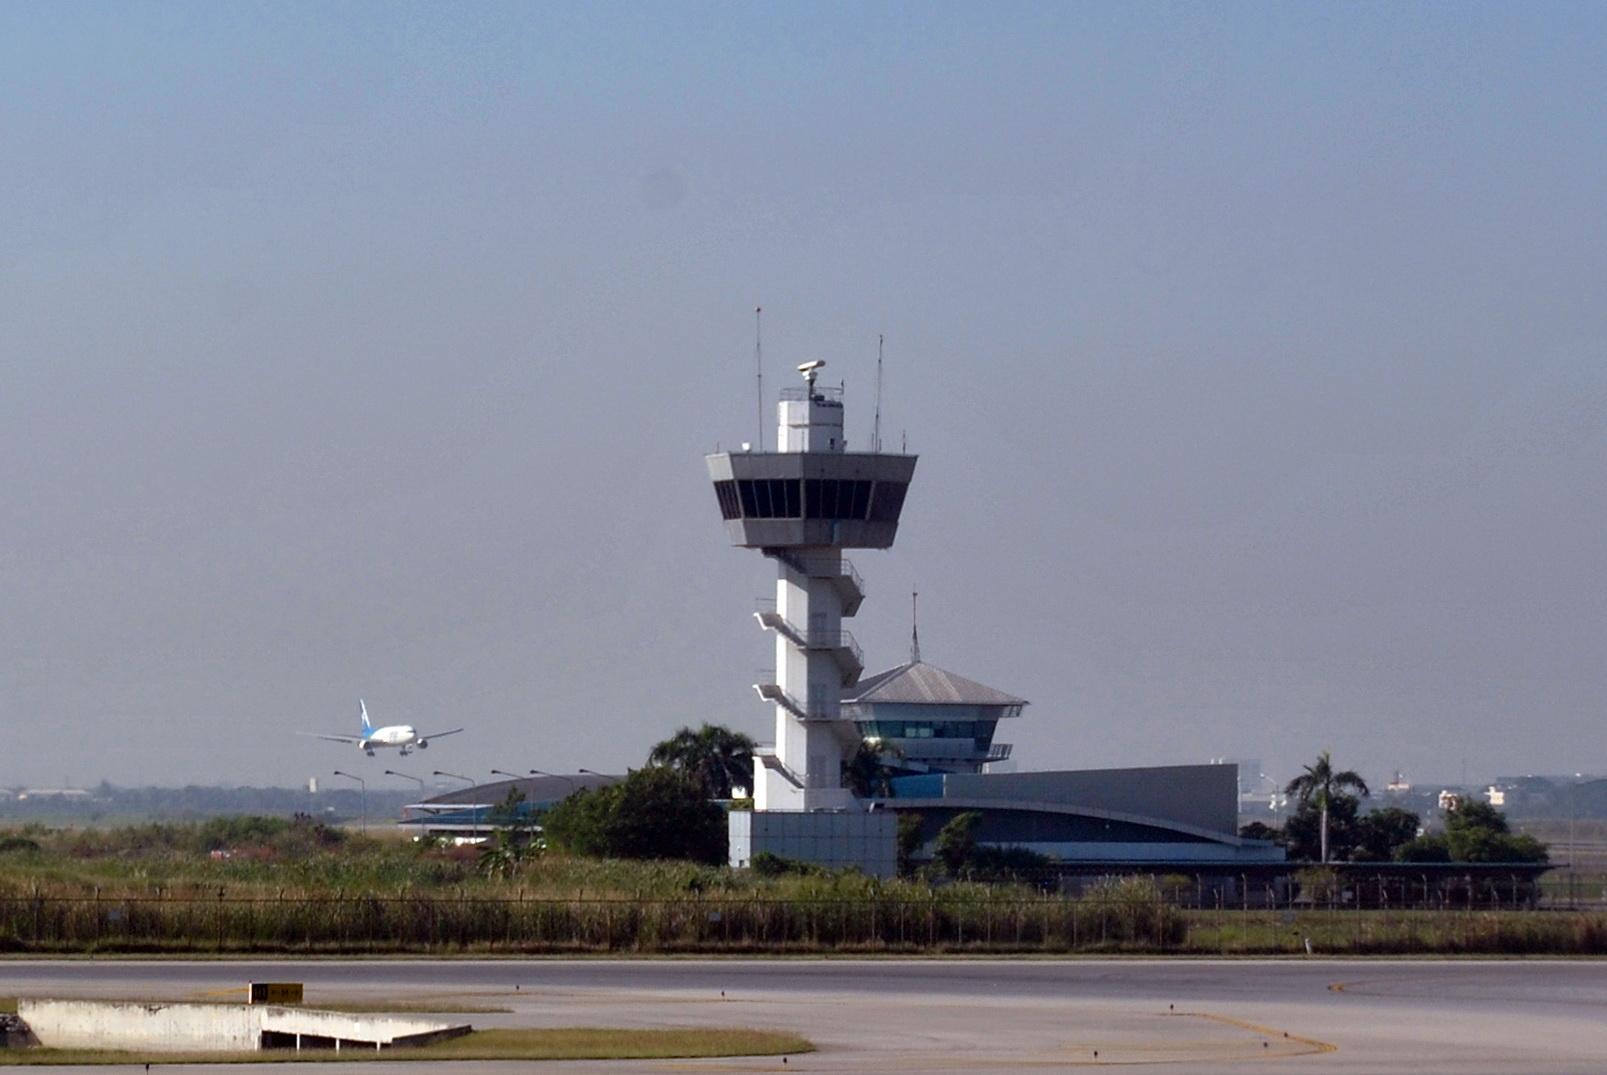 Башня ATC в аэропорту Бангкок Суварнабуми